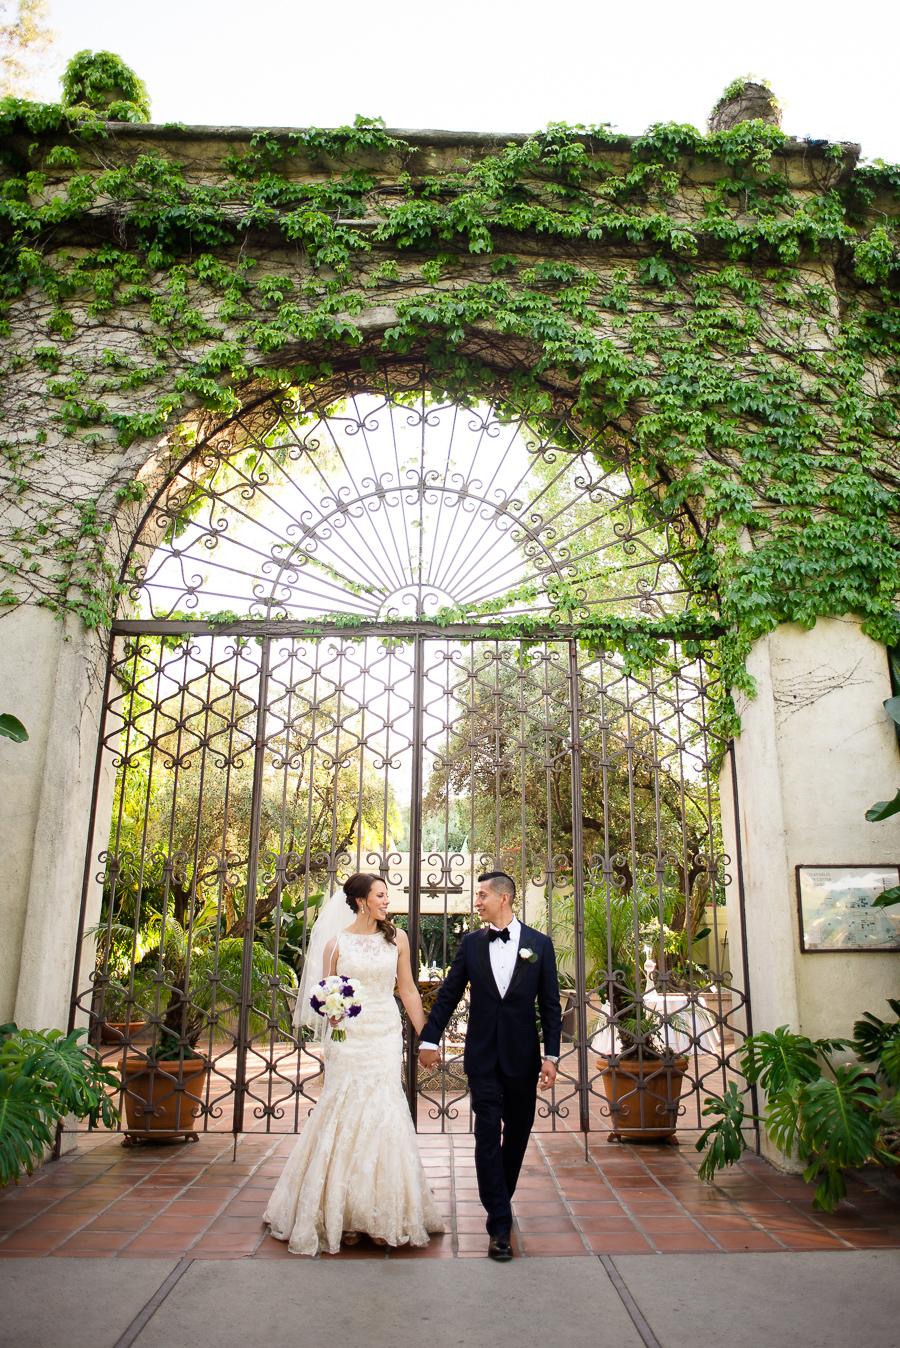 Williamsport wedding photographer